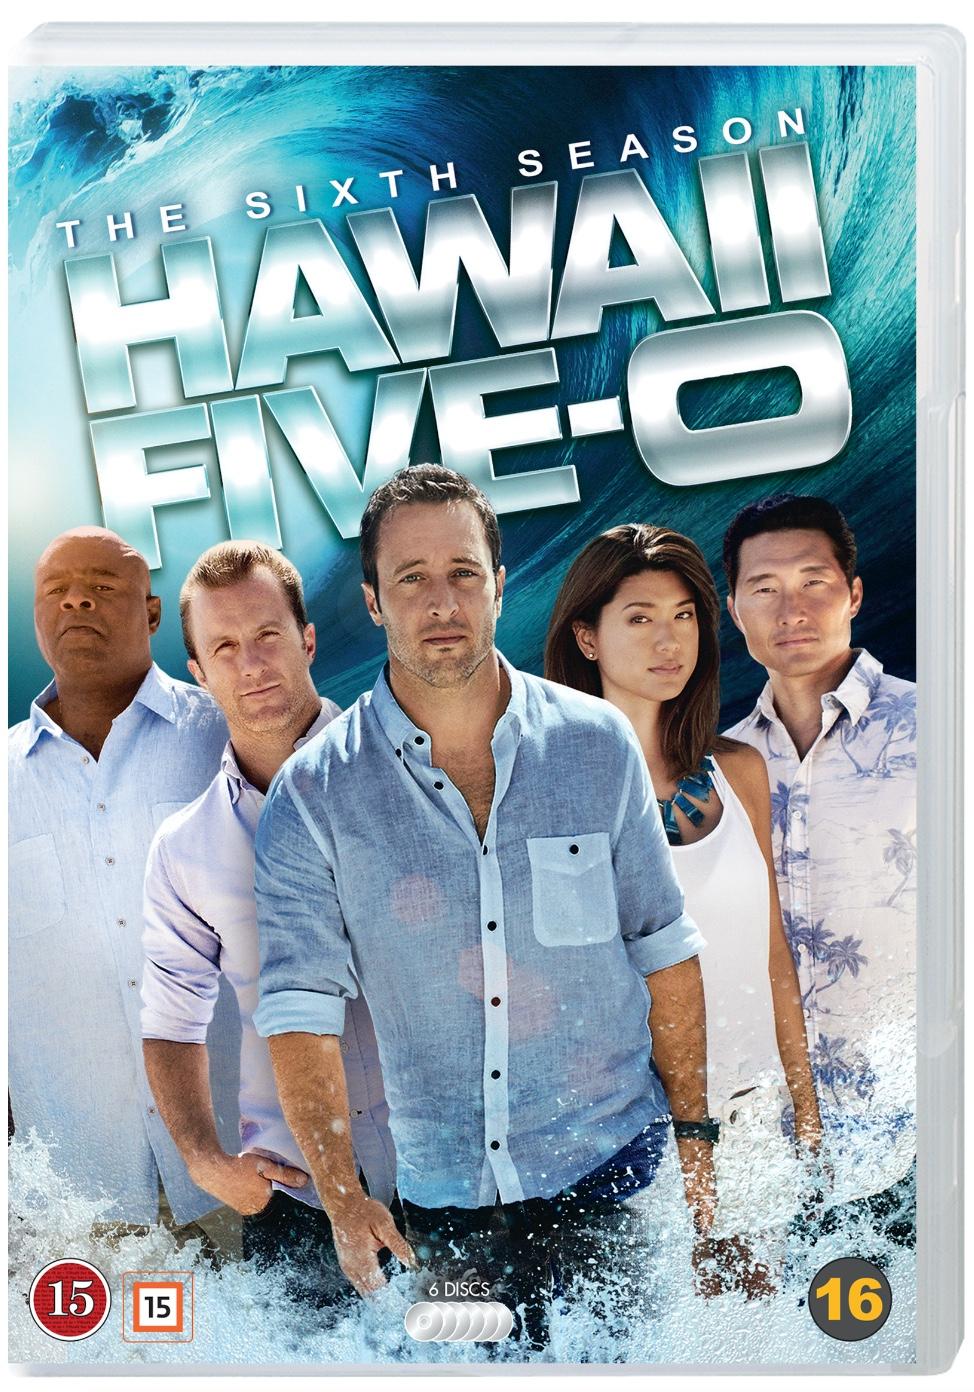 HAWAII FIVE-O season 6 cover